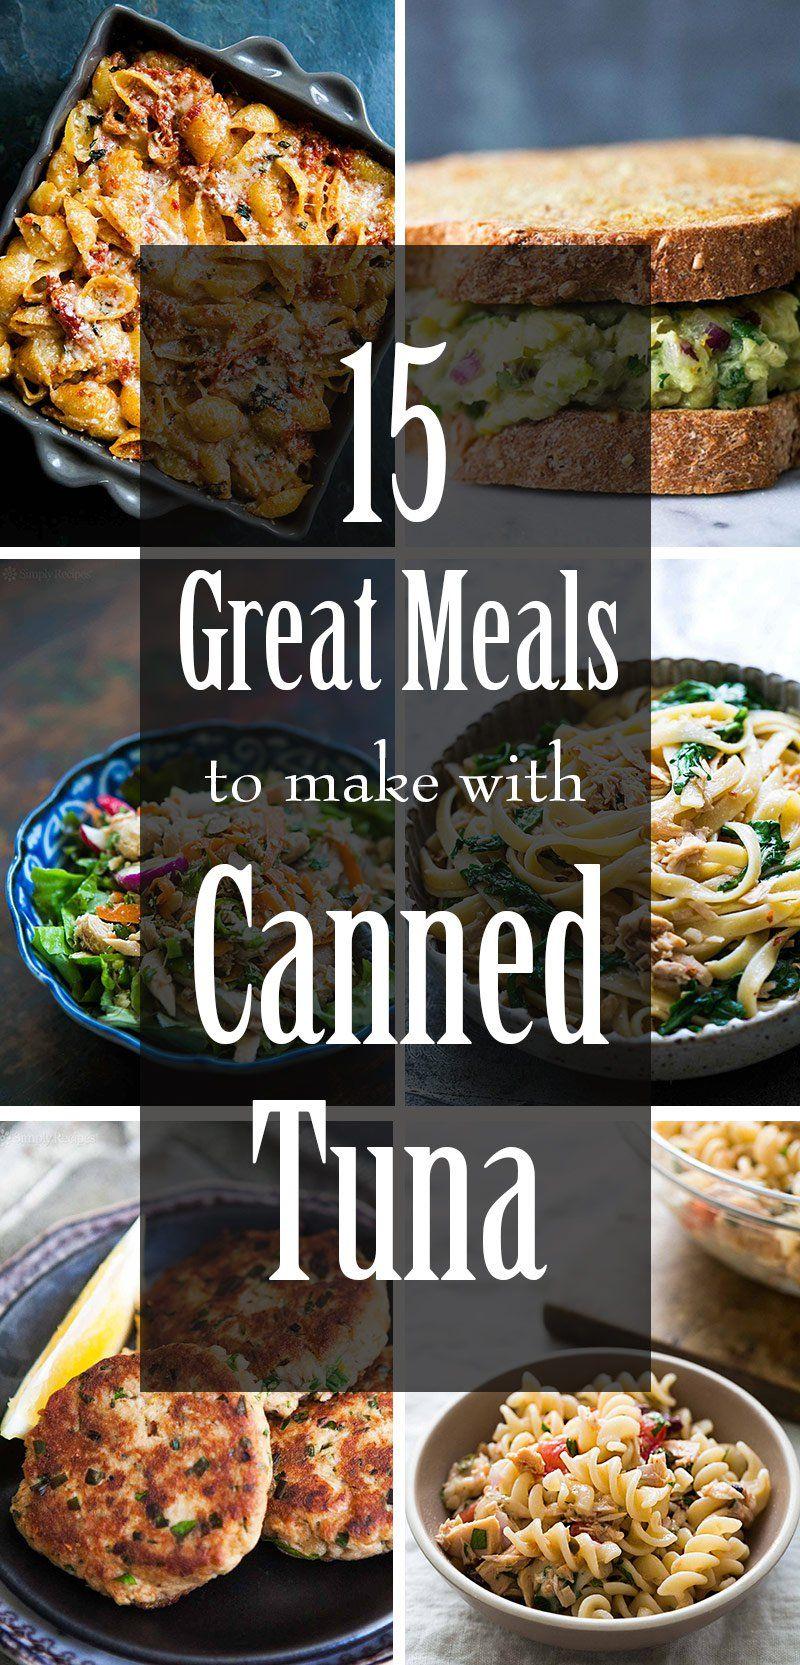 15 Awesome Recipes For Canned Tuna Tuna Patties Tuna Salad Tuna